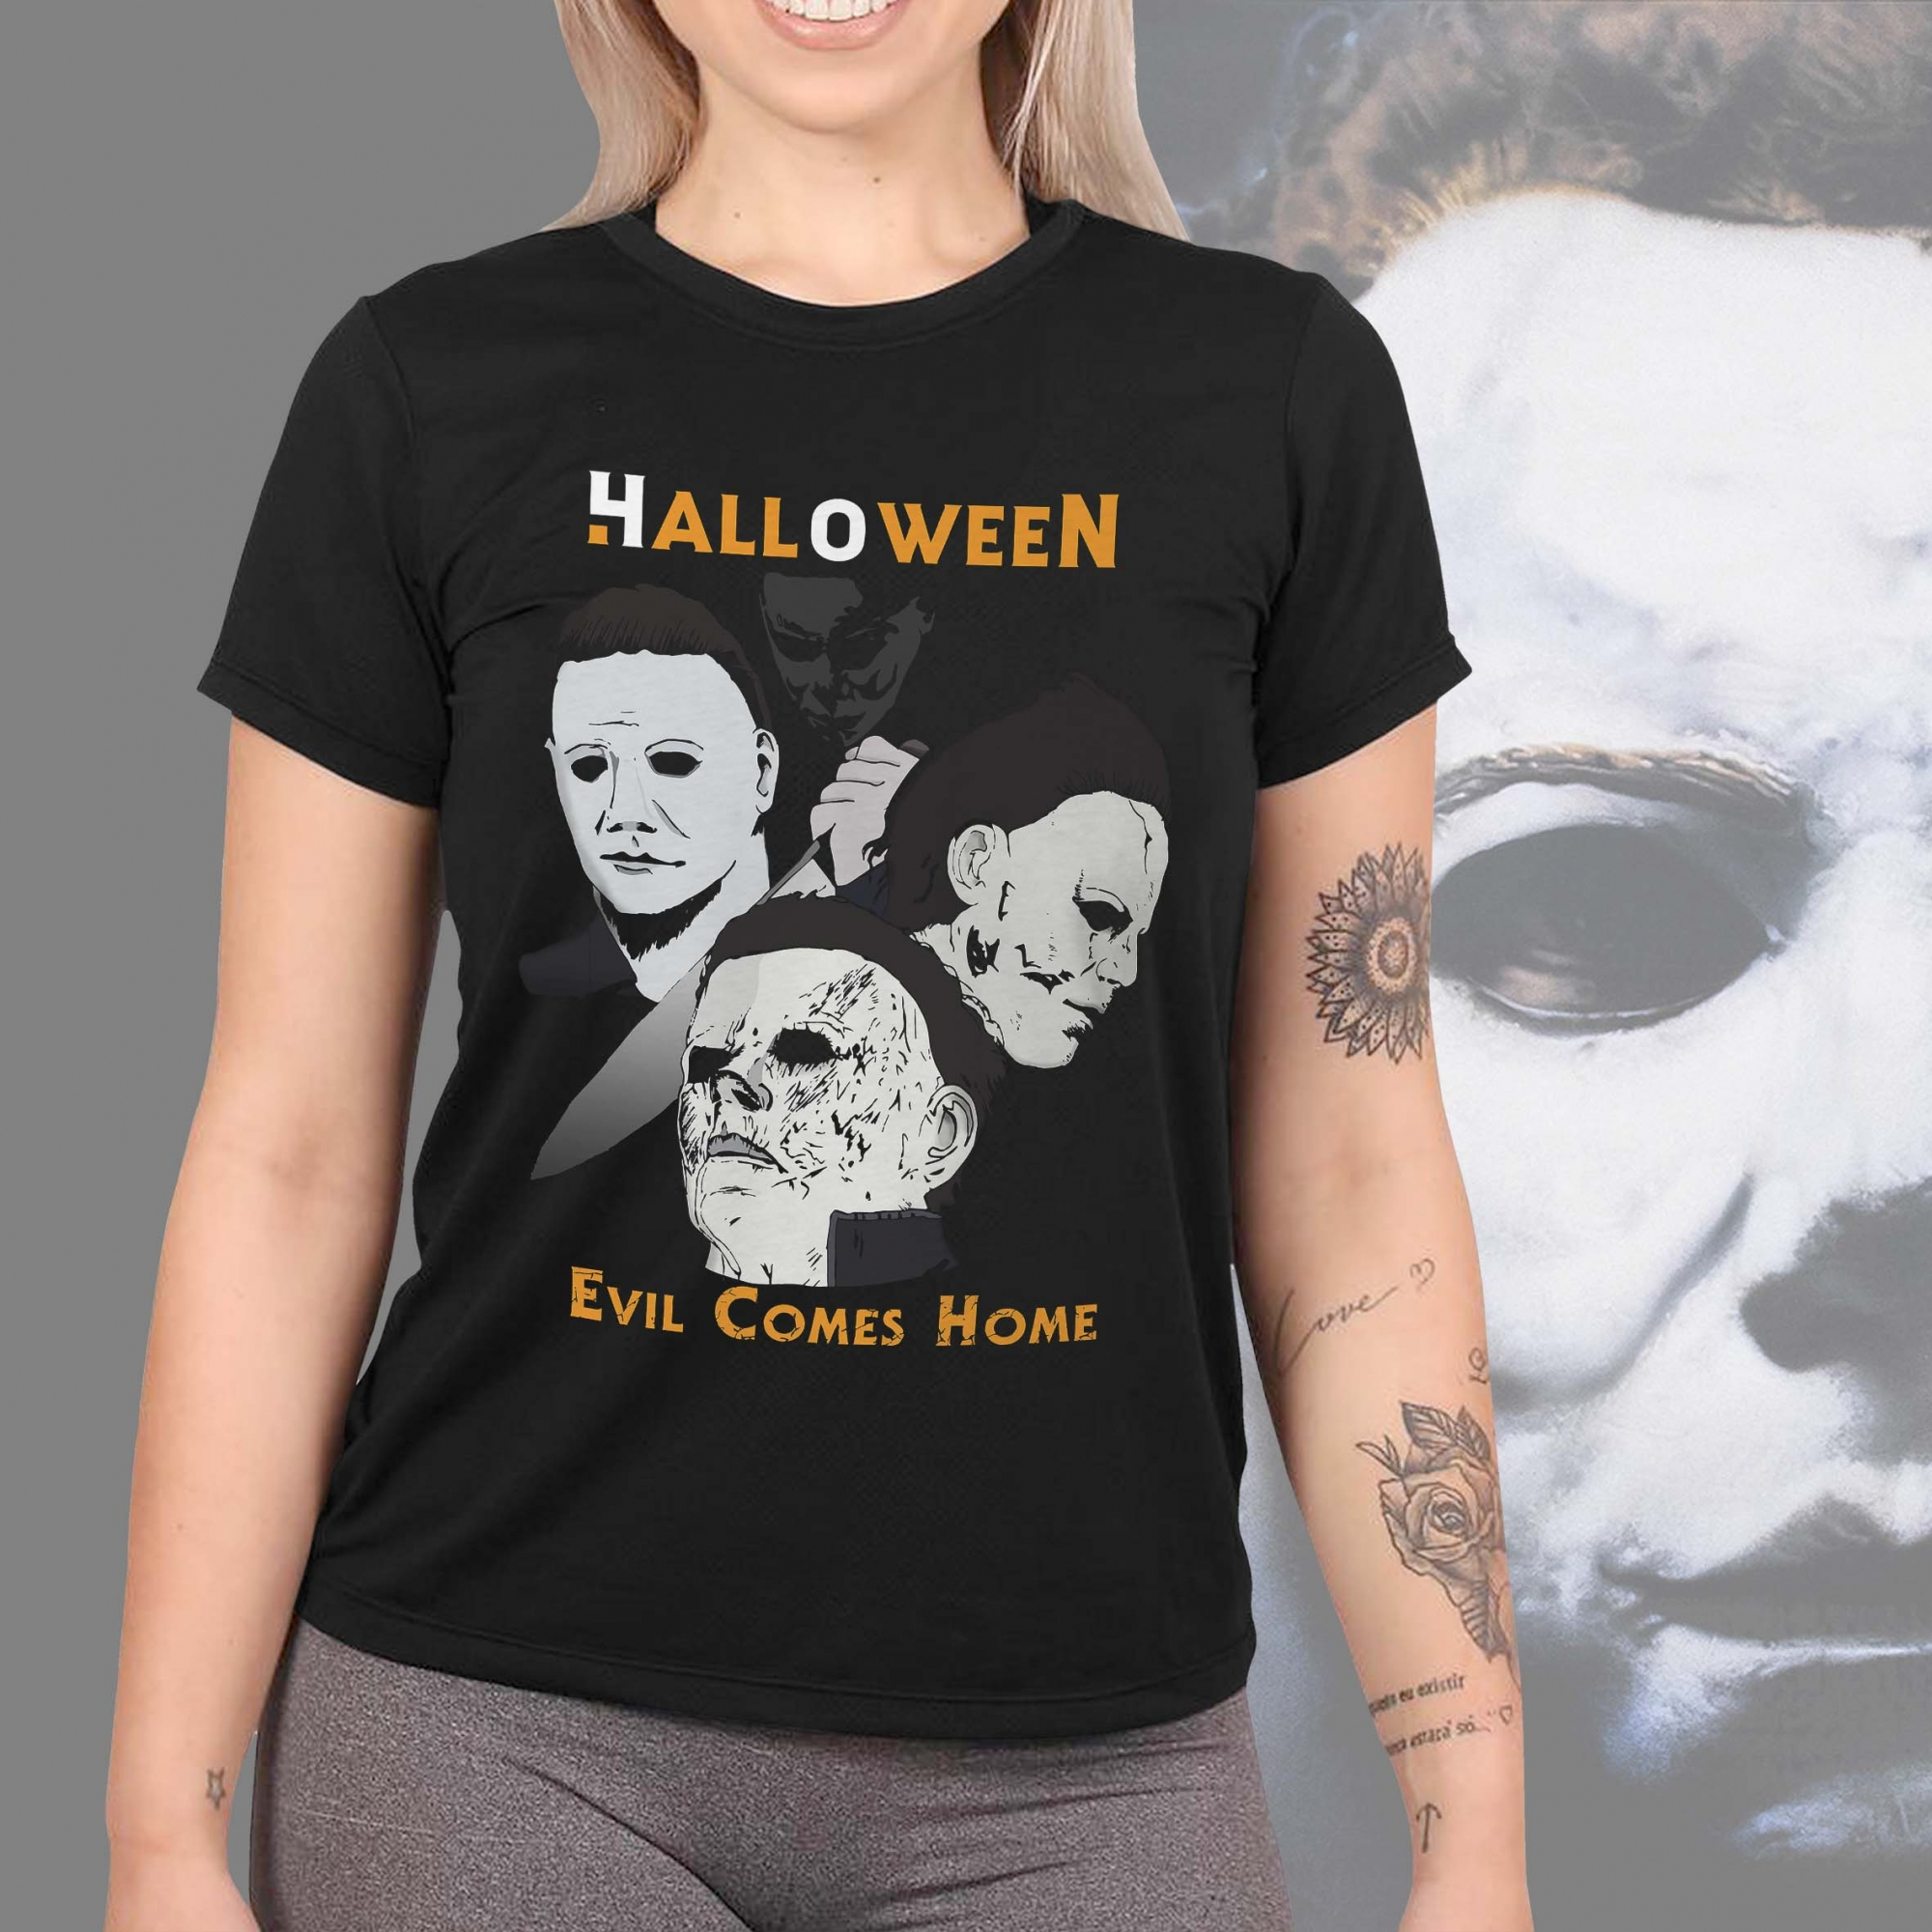 Camiseta Feminina Unissex Michael Myers Halloween Evil Comes Home Terror Horror (Preta) - EV